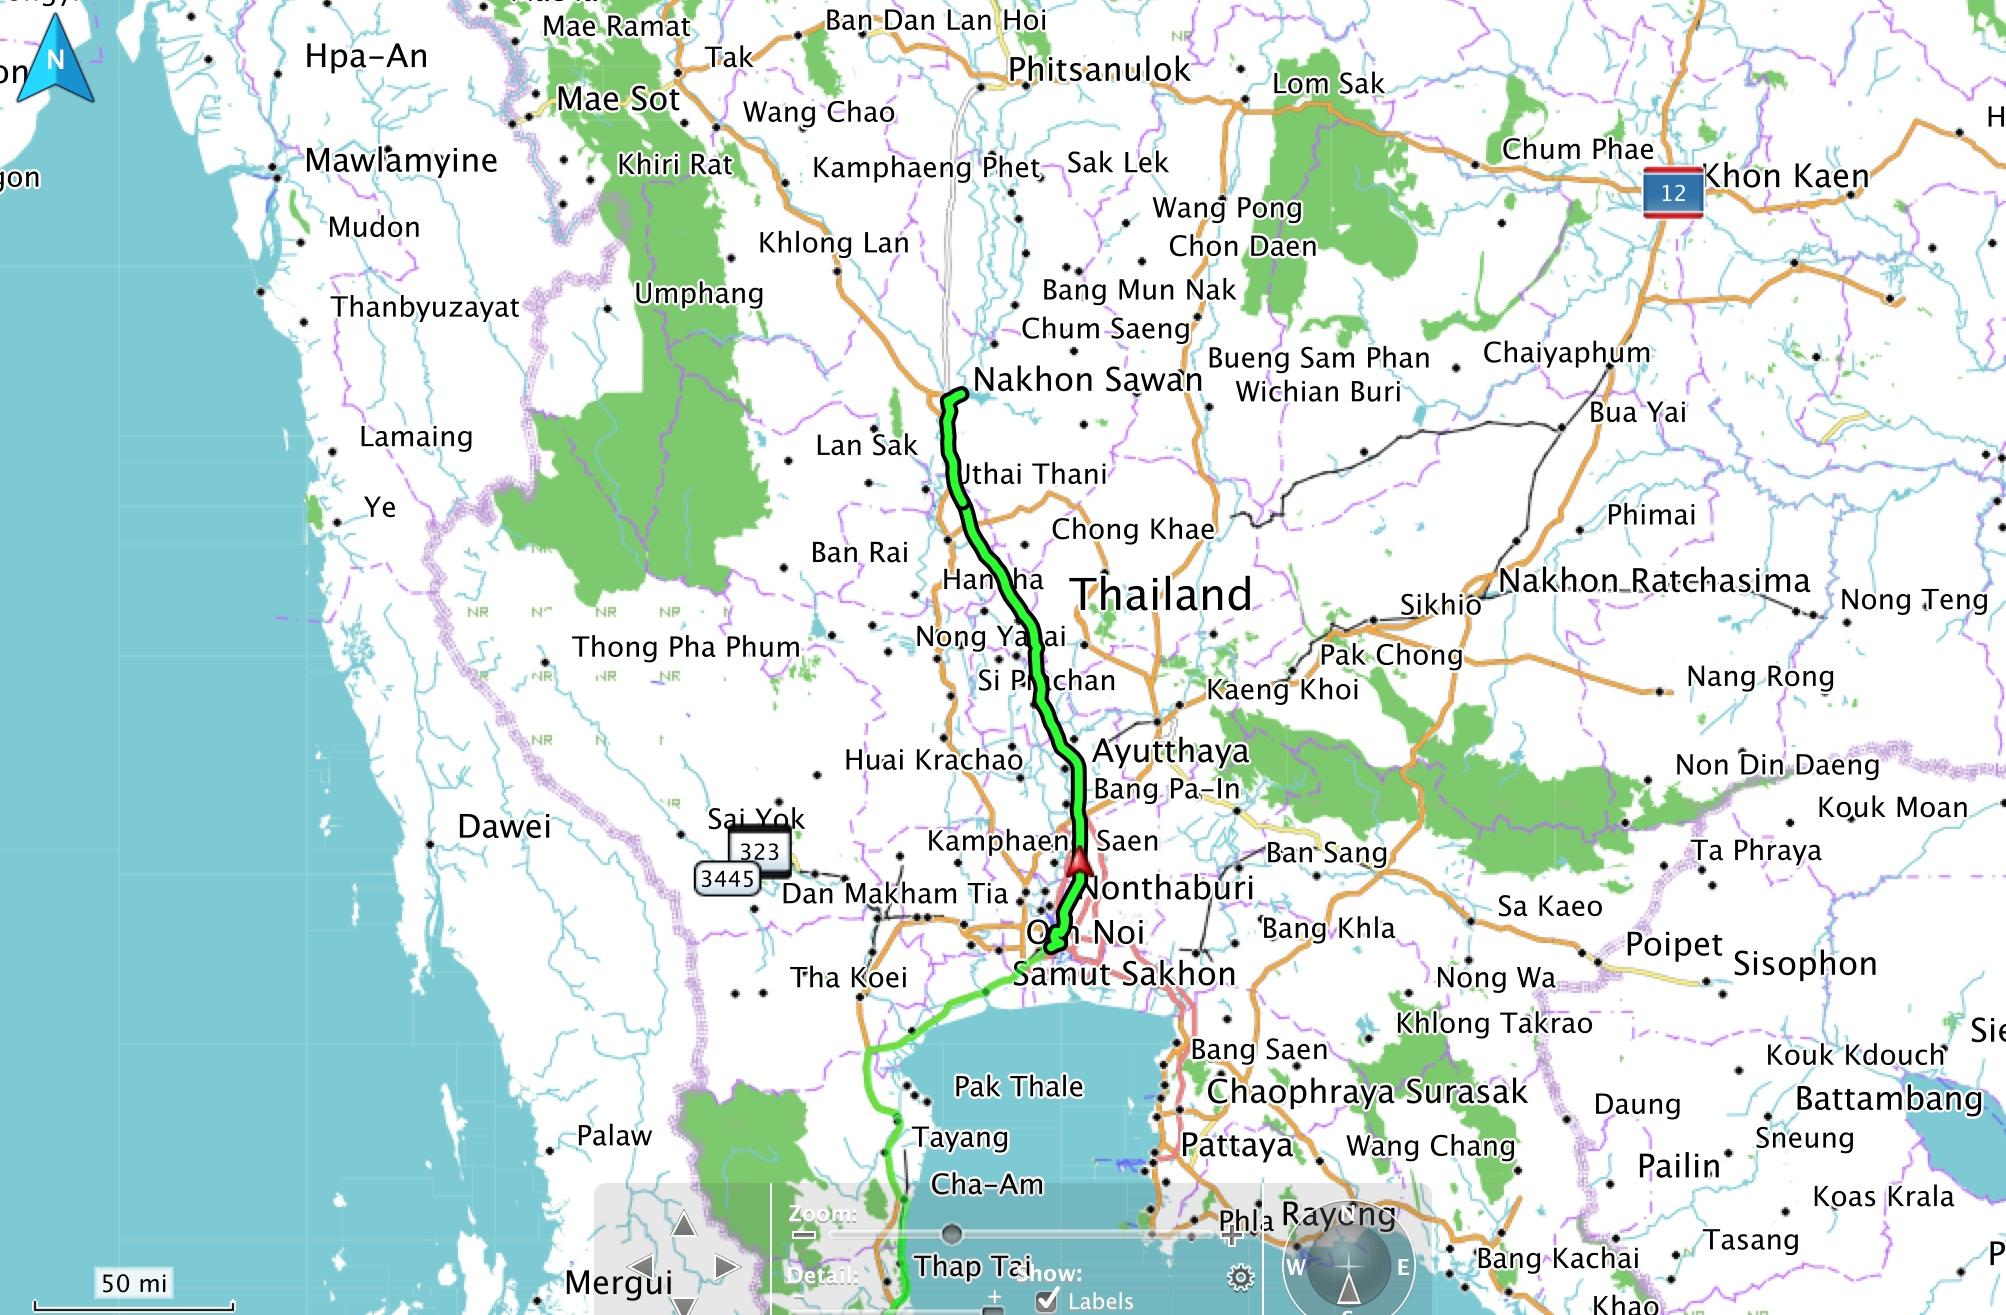 Phitsanulok Thailand Map.Bangkok To Phitsanulok Deer Park